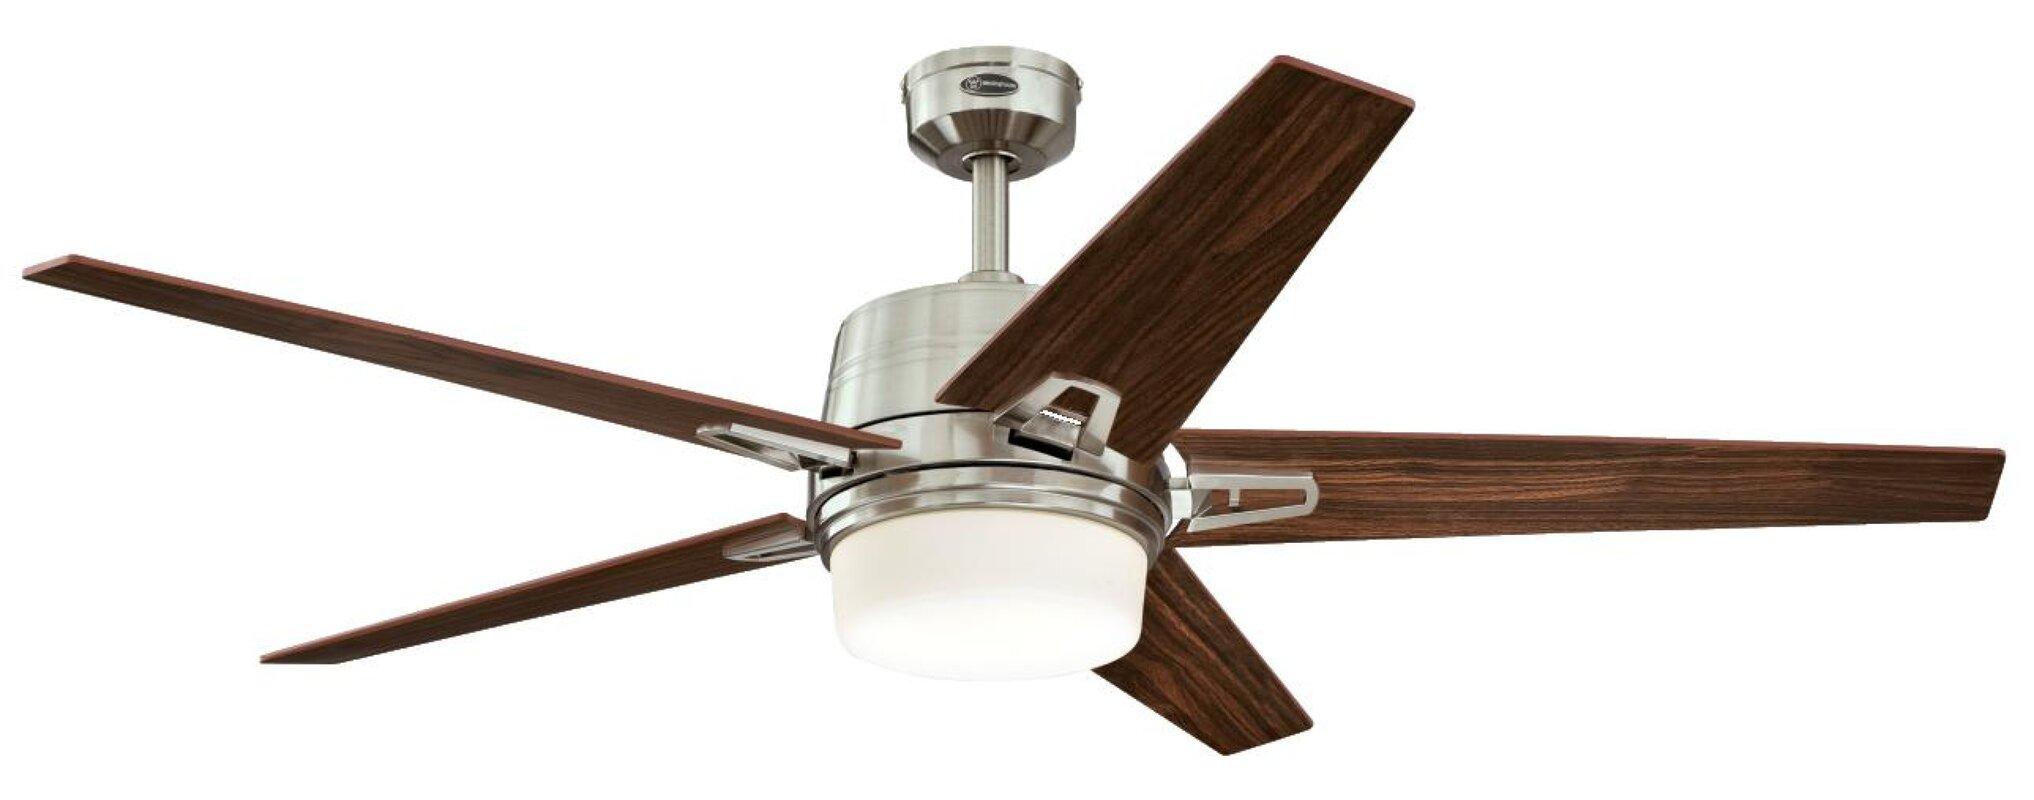 Westinghouse lighting 56 zephyr 5 blade ceiling fan with remote 56 zephyr 5 blade ceiling fan with remote mozeypictures Images